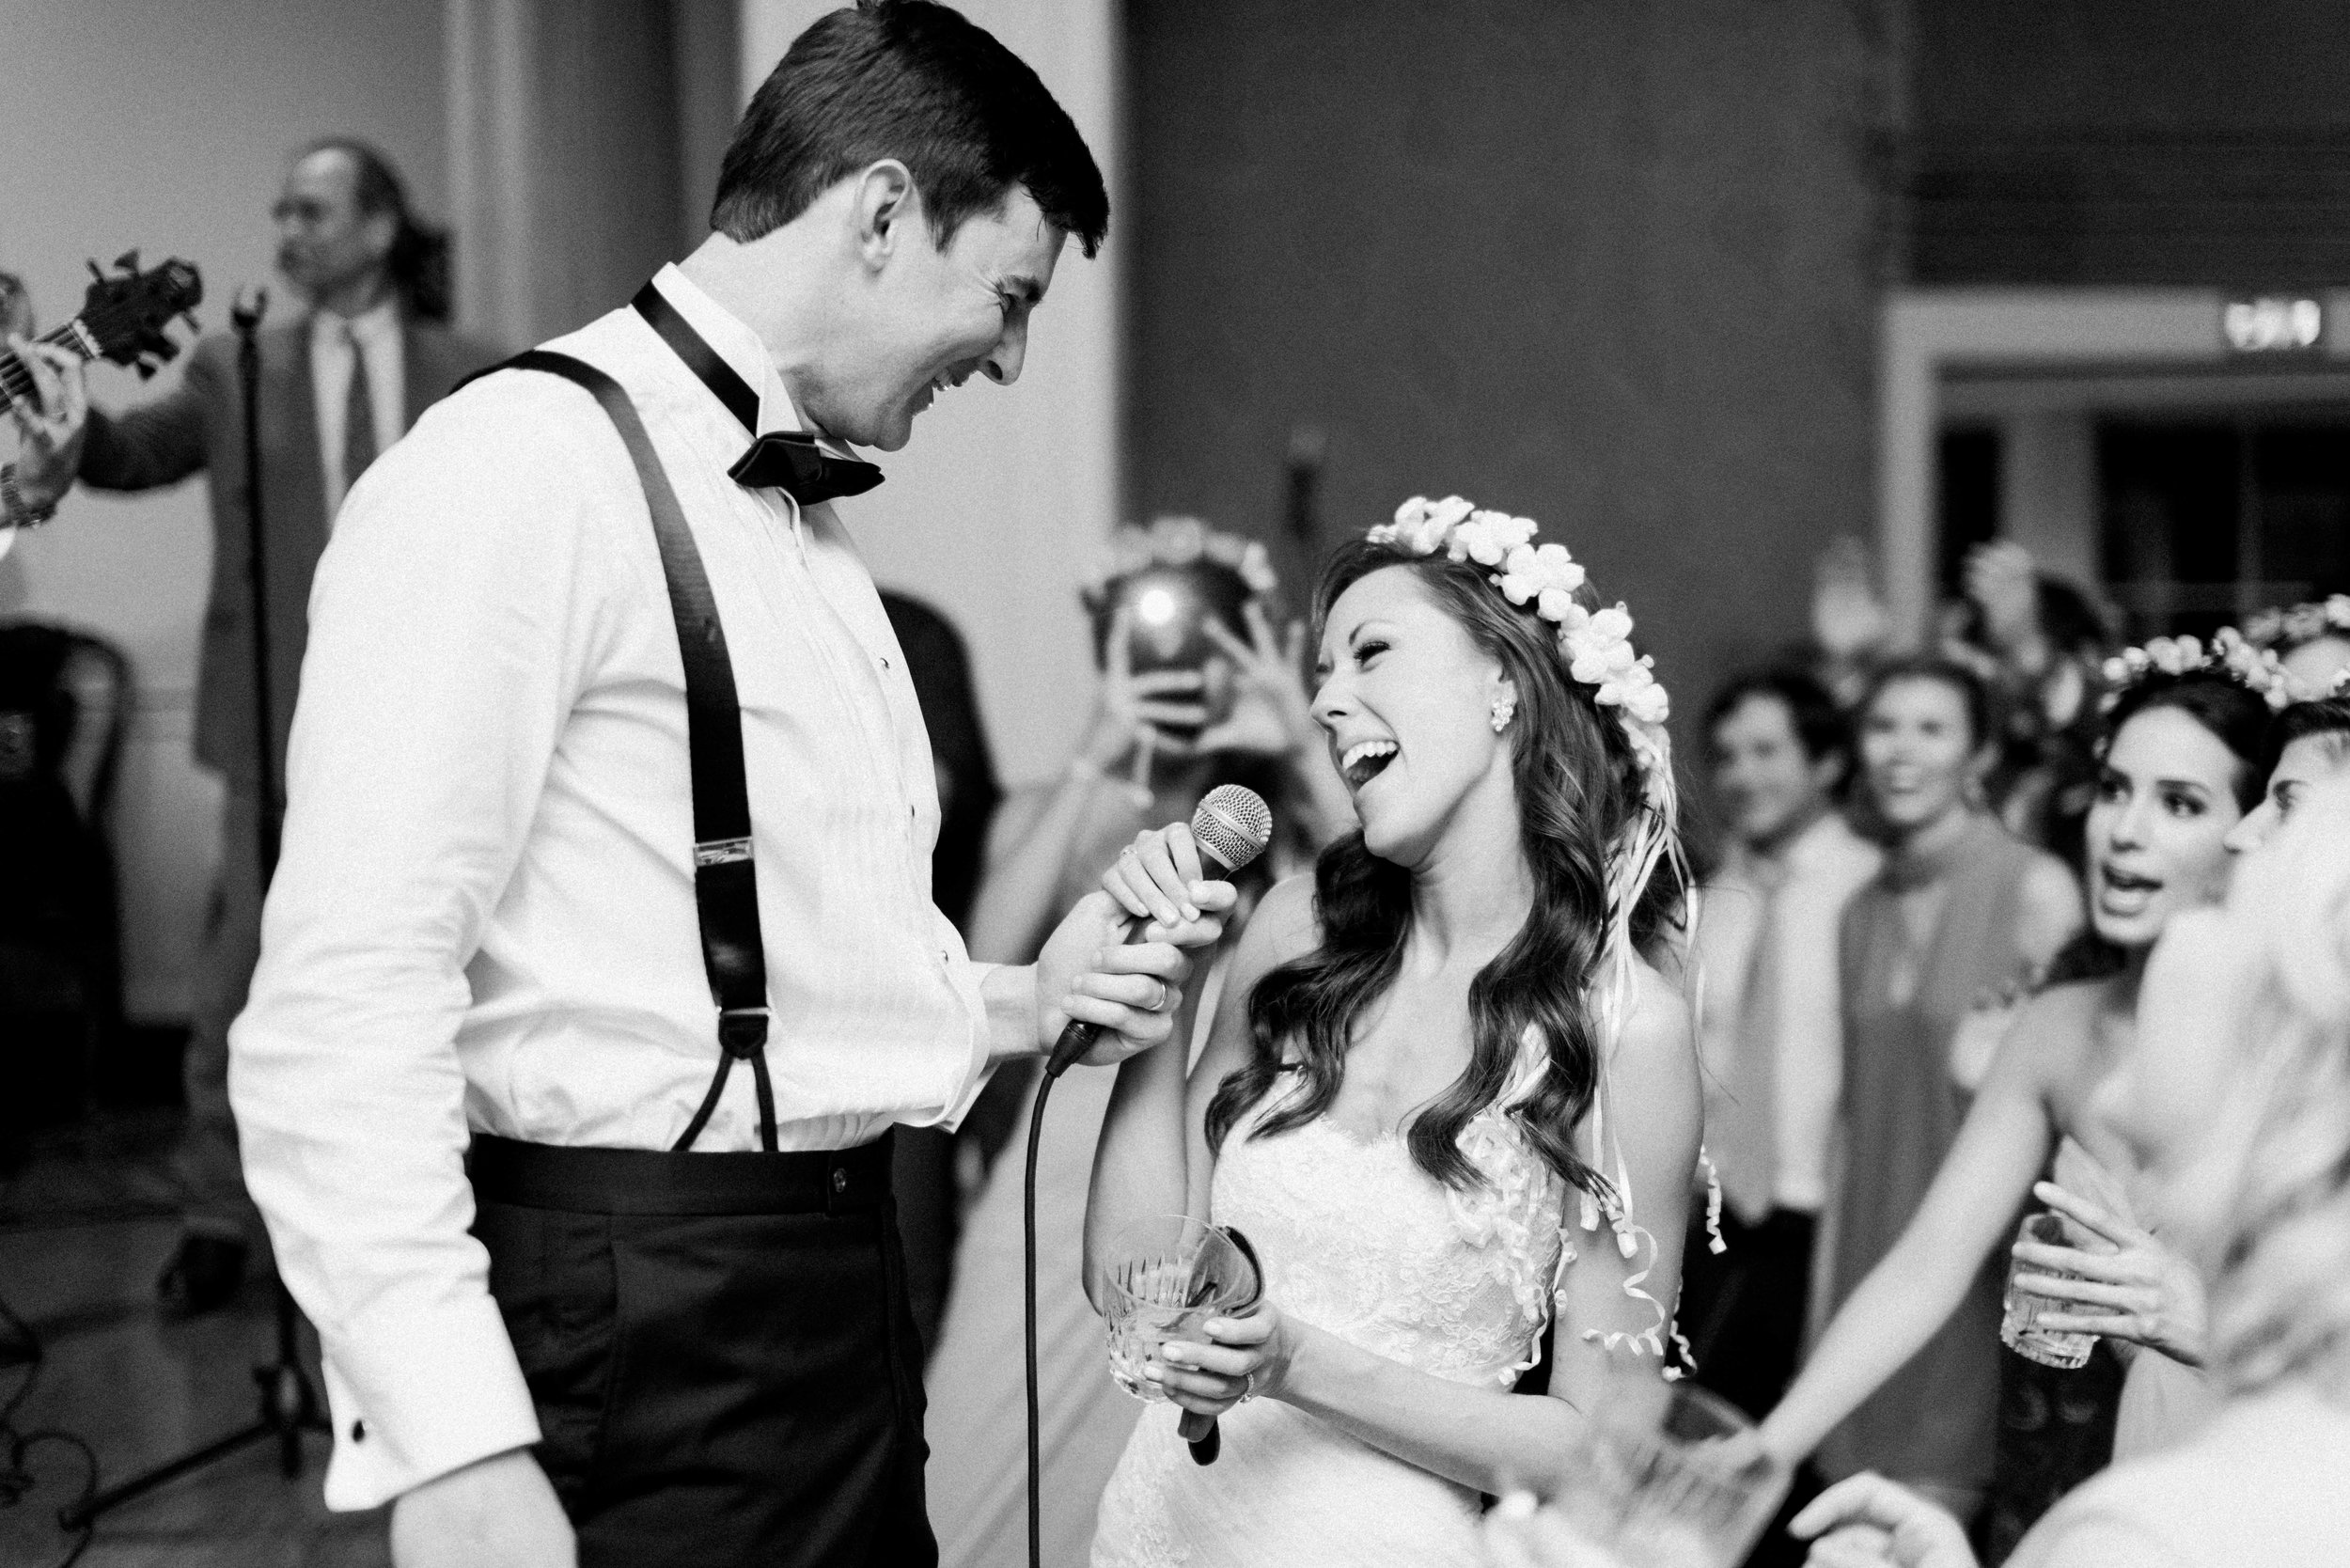 St.-Philip-Presbyterian-Church-Houston-Wedding-Ceremony-The-Junior-League-Of-Houston-Reception-Dana-Fernandez-Photography-Fine-Art-Film-37.jpg